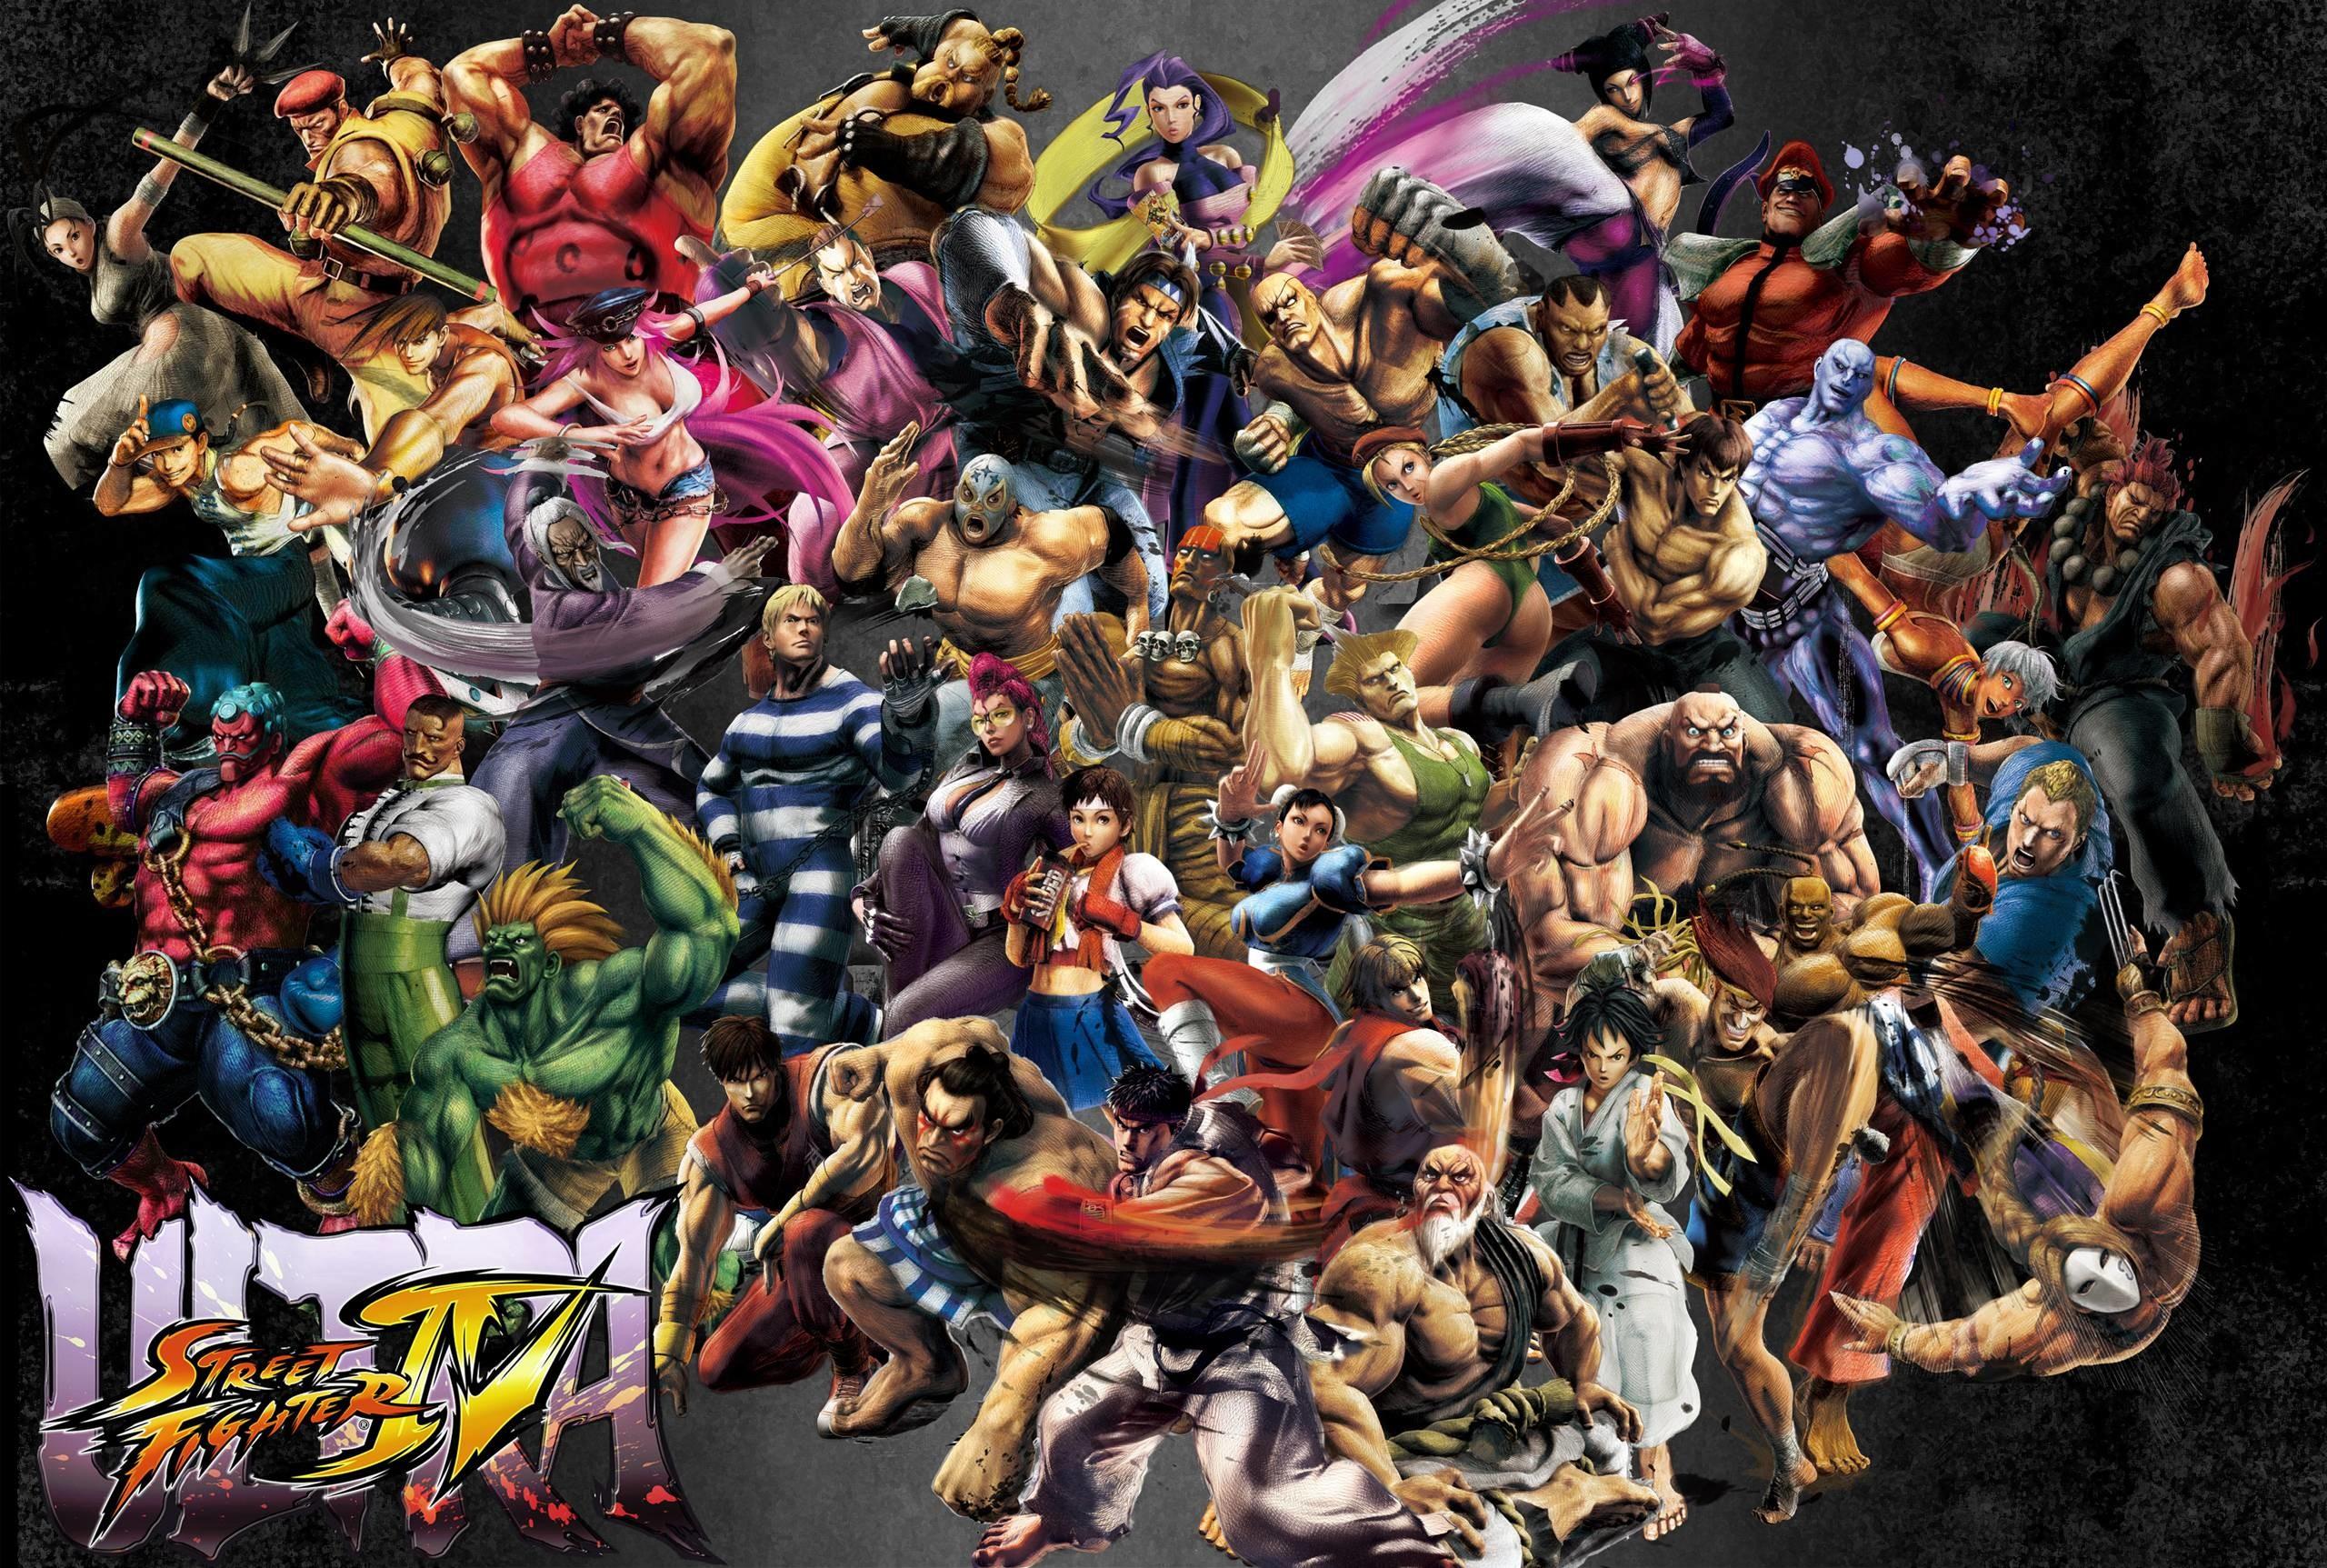 street fighter 4 wallpaper 62 images